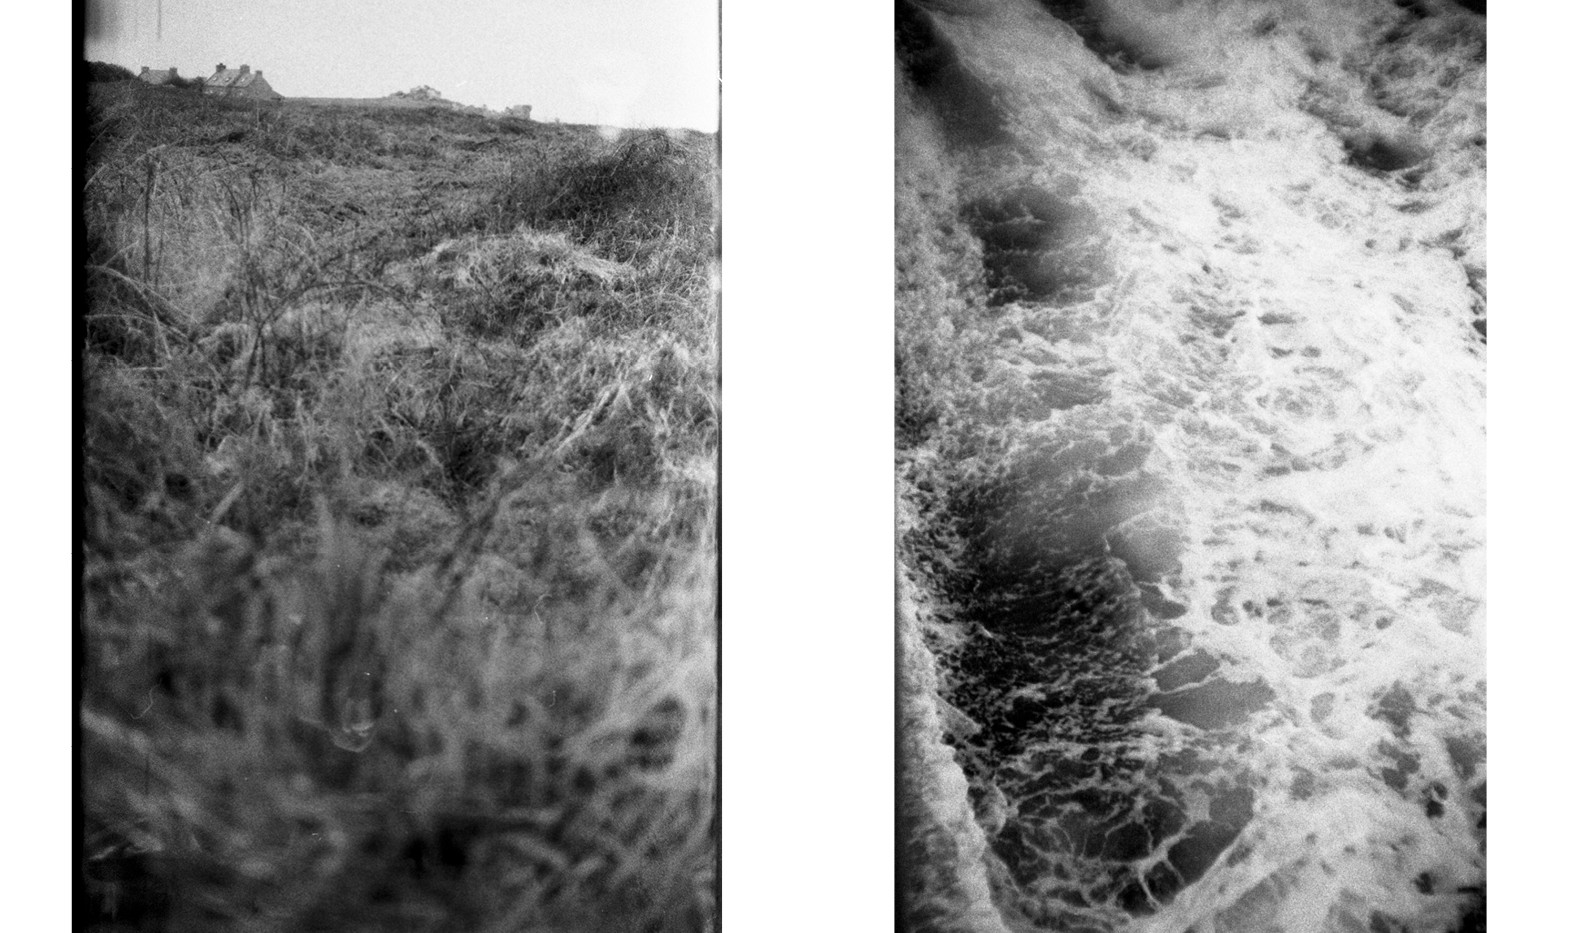 Echos © Léa Neuville